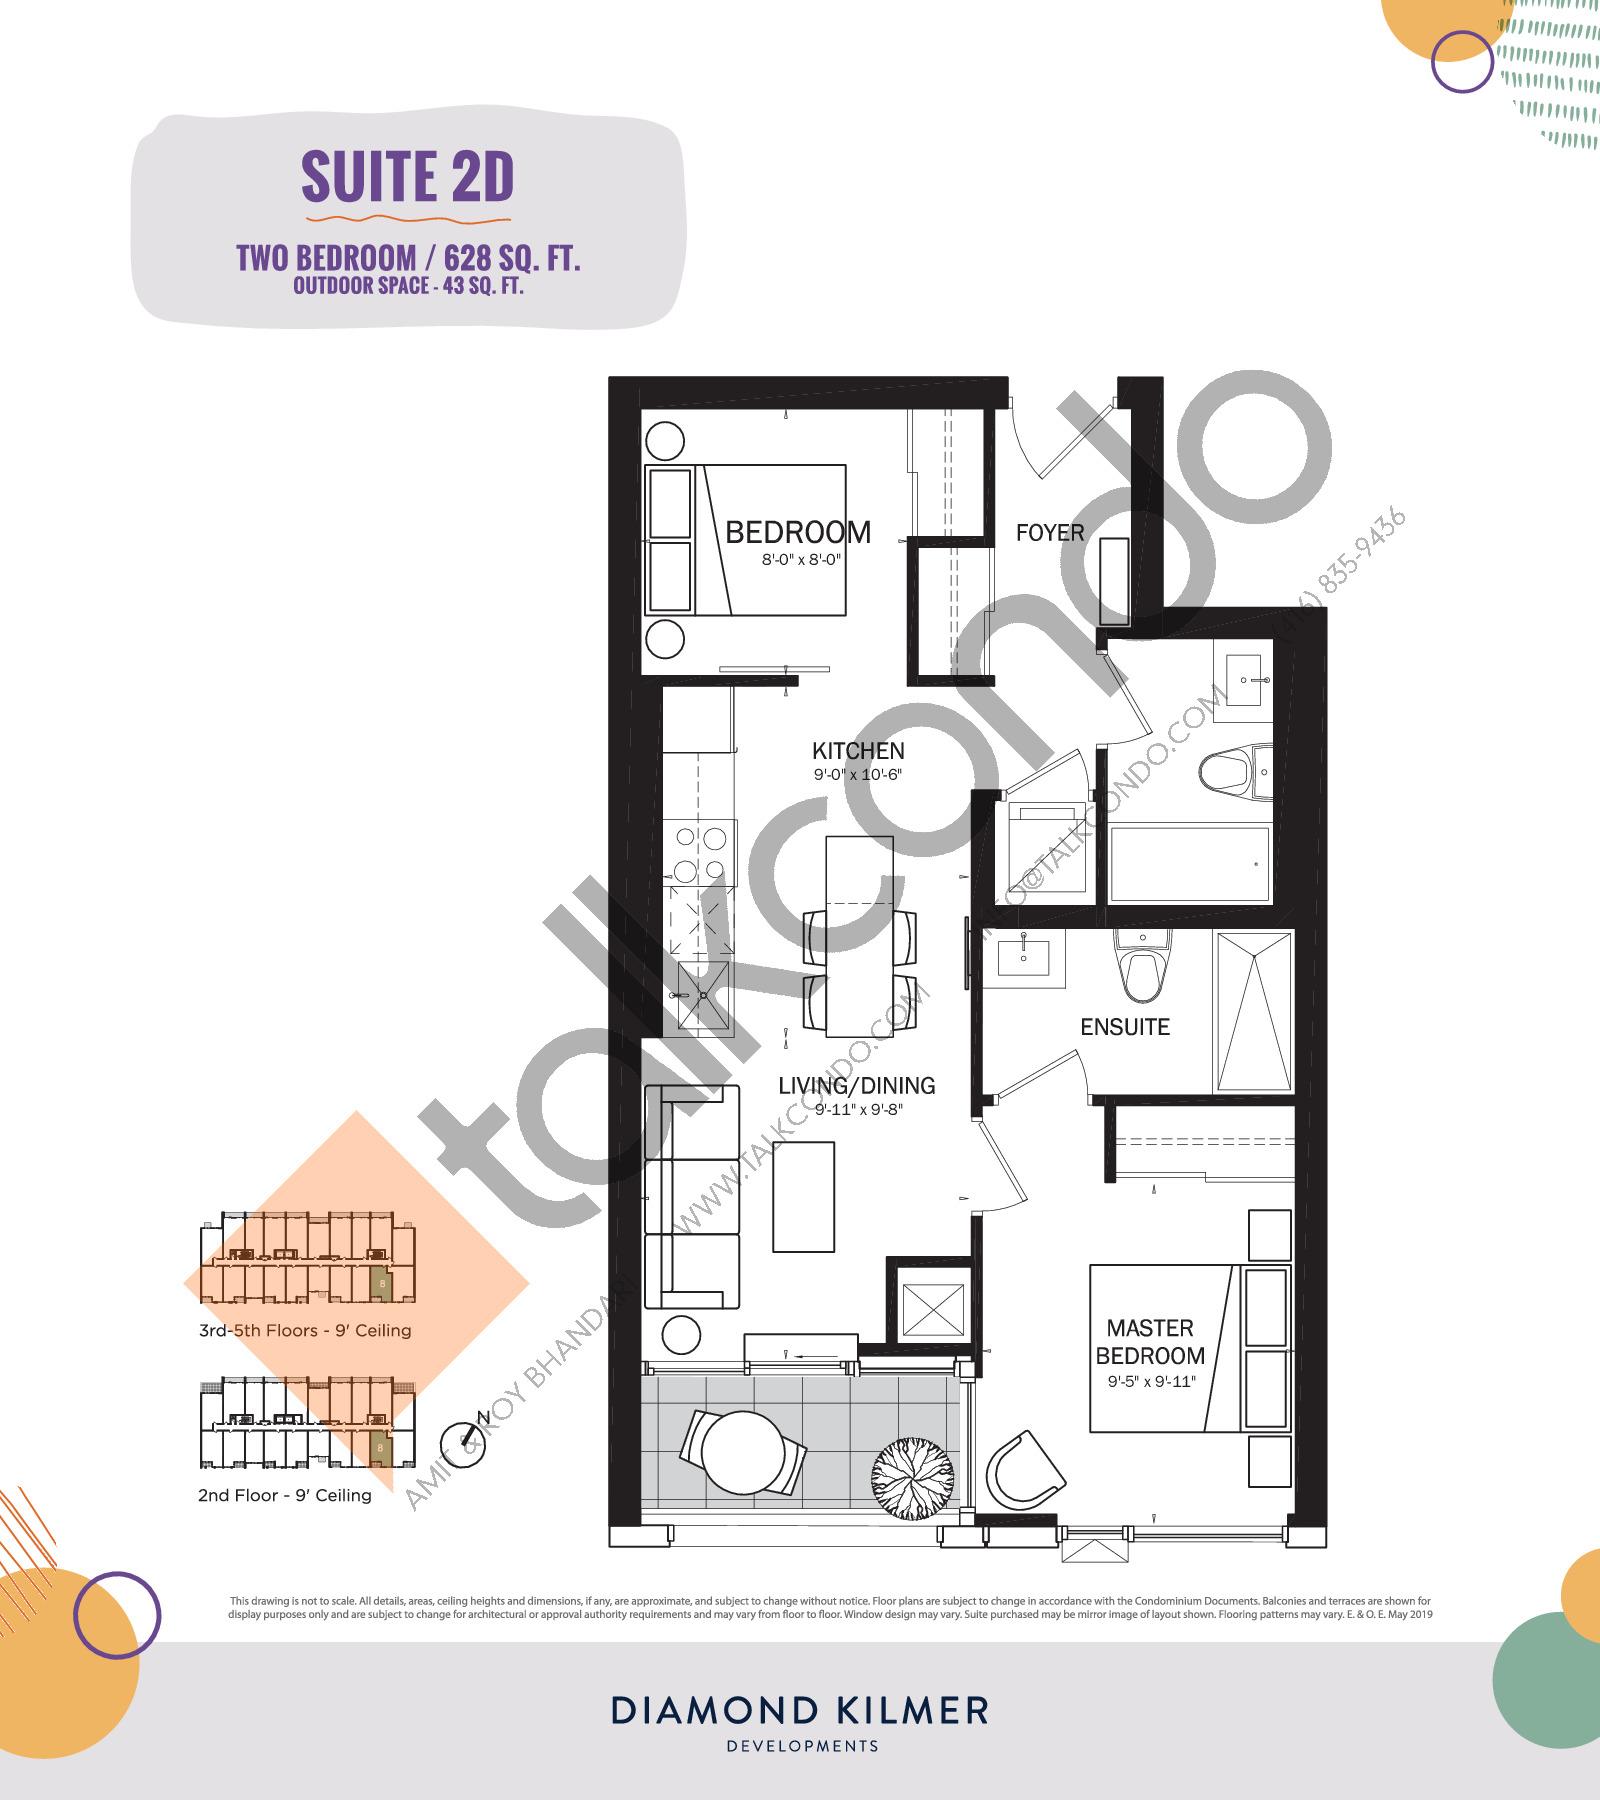 2D Floor Plan at Reunion Crossing Condos & Urban Towns - 628 sq.ft